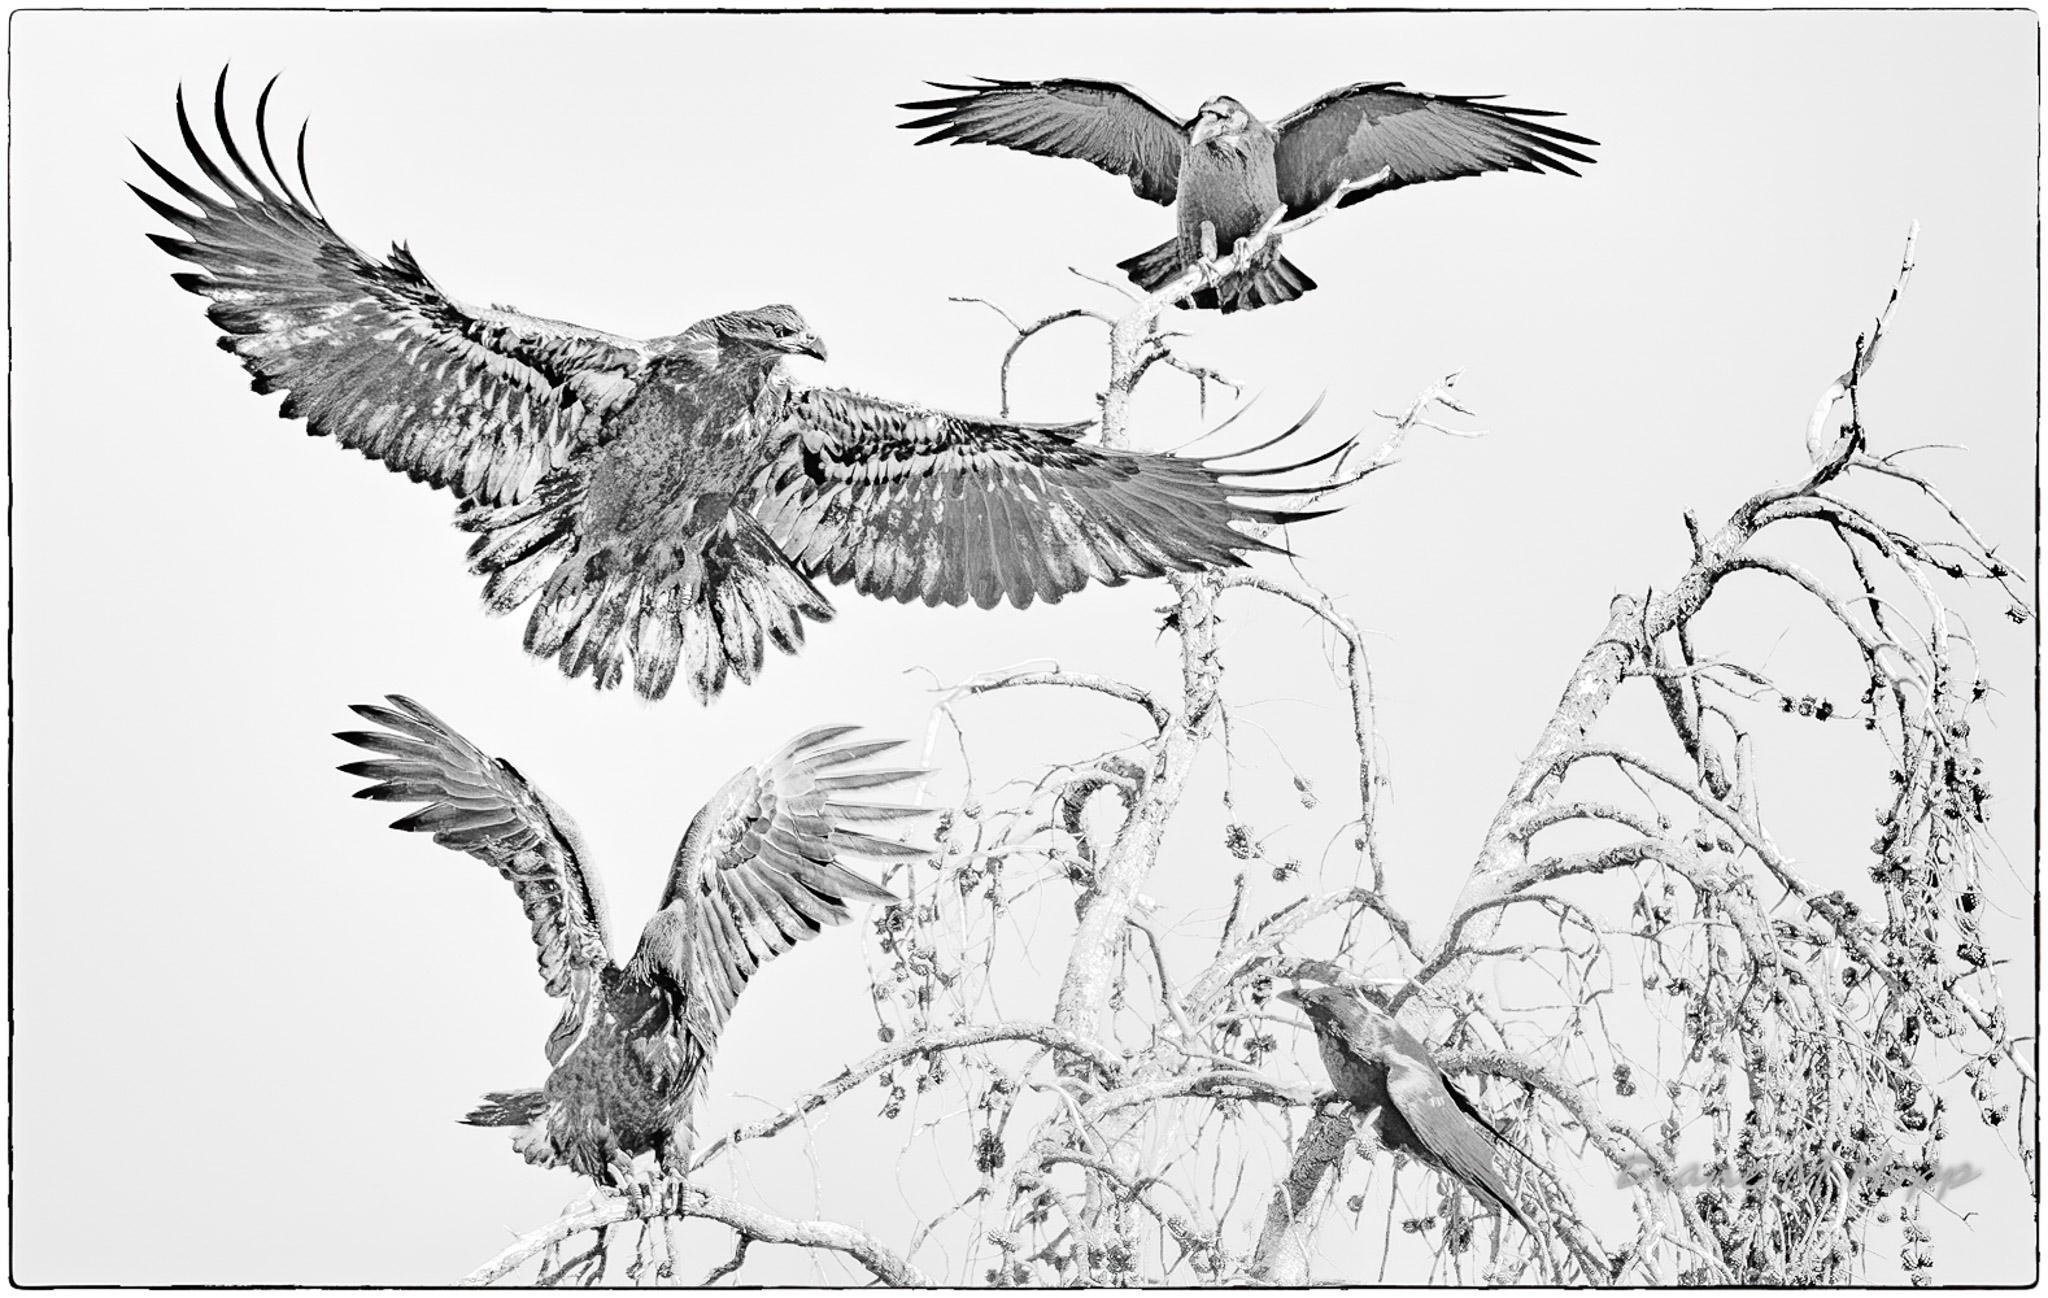 Eagles Versus Crows - DMHoppAC